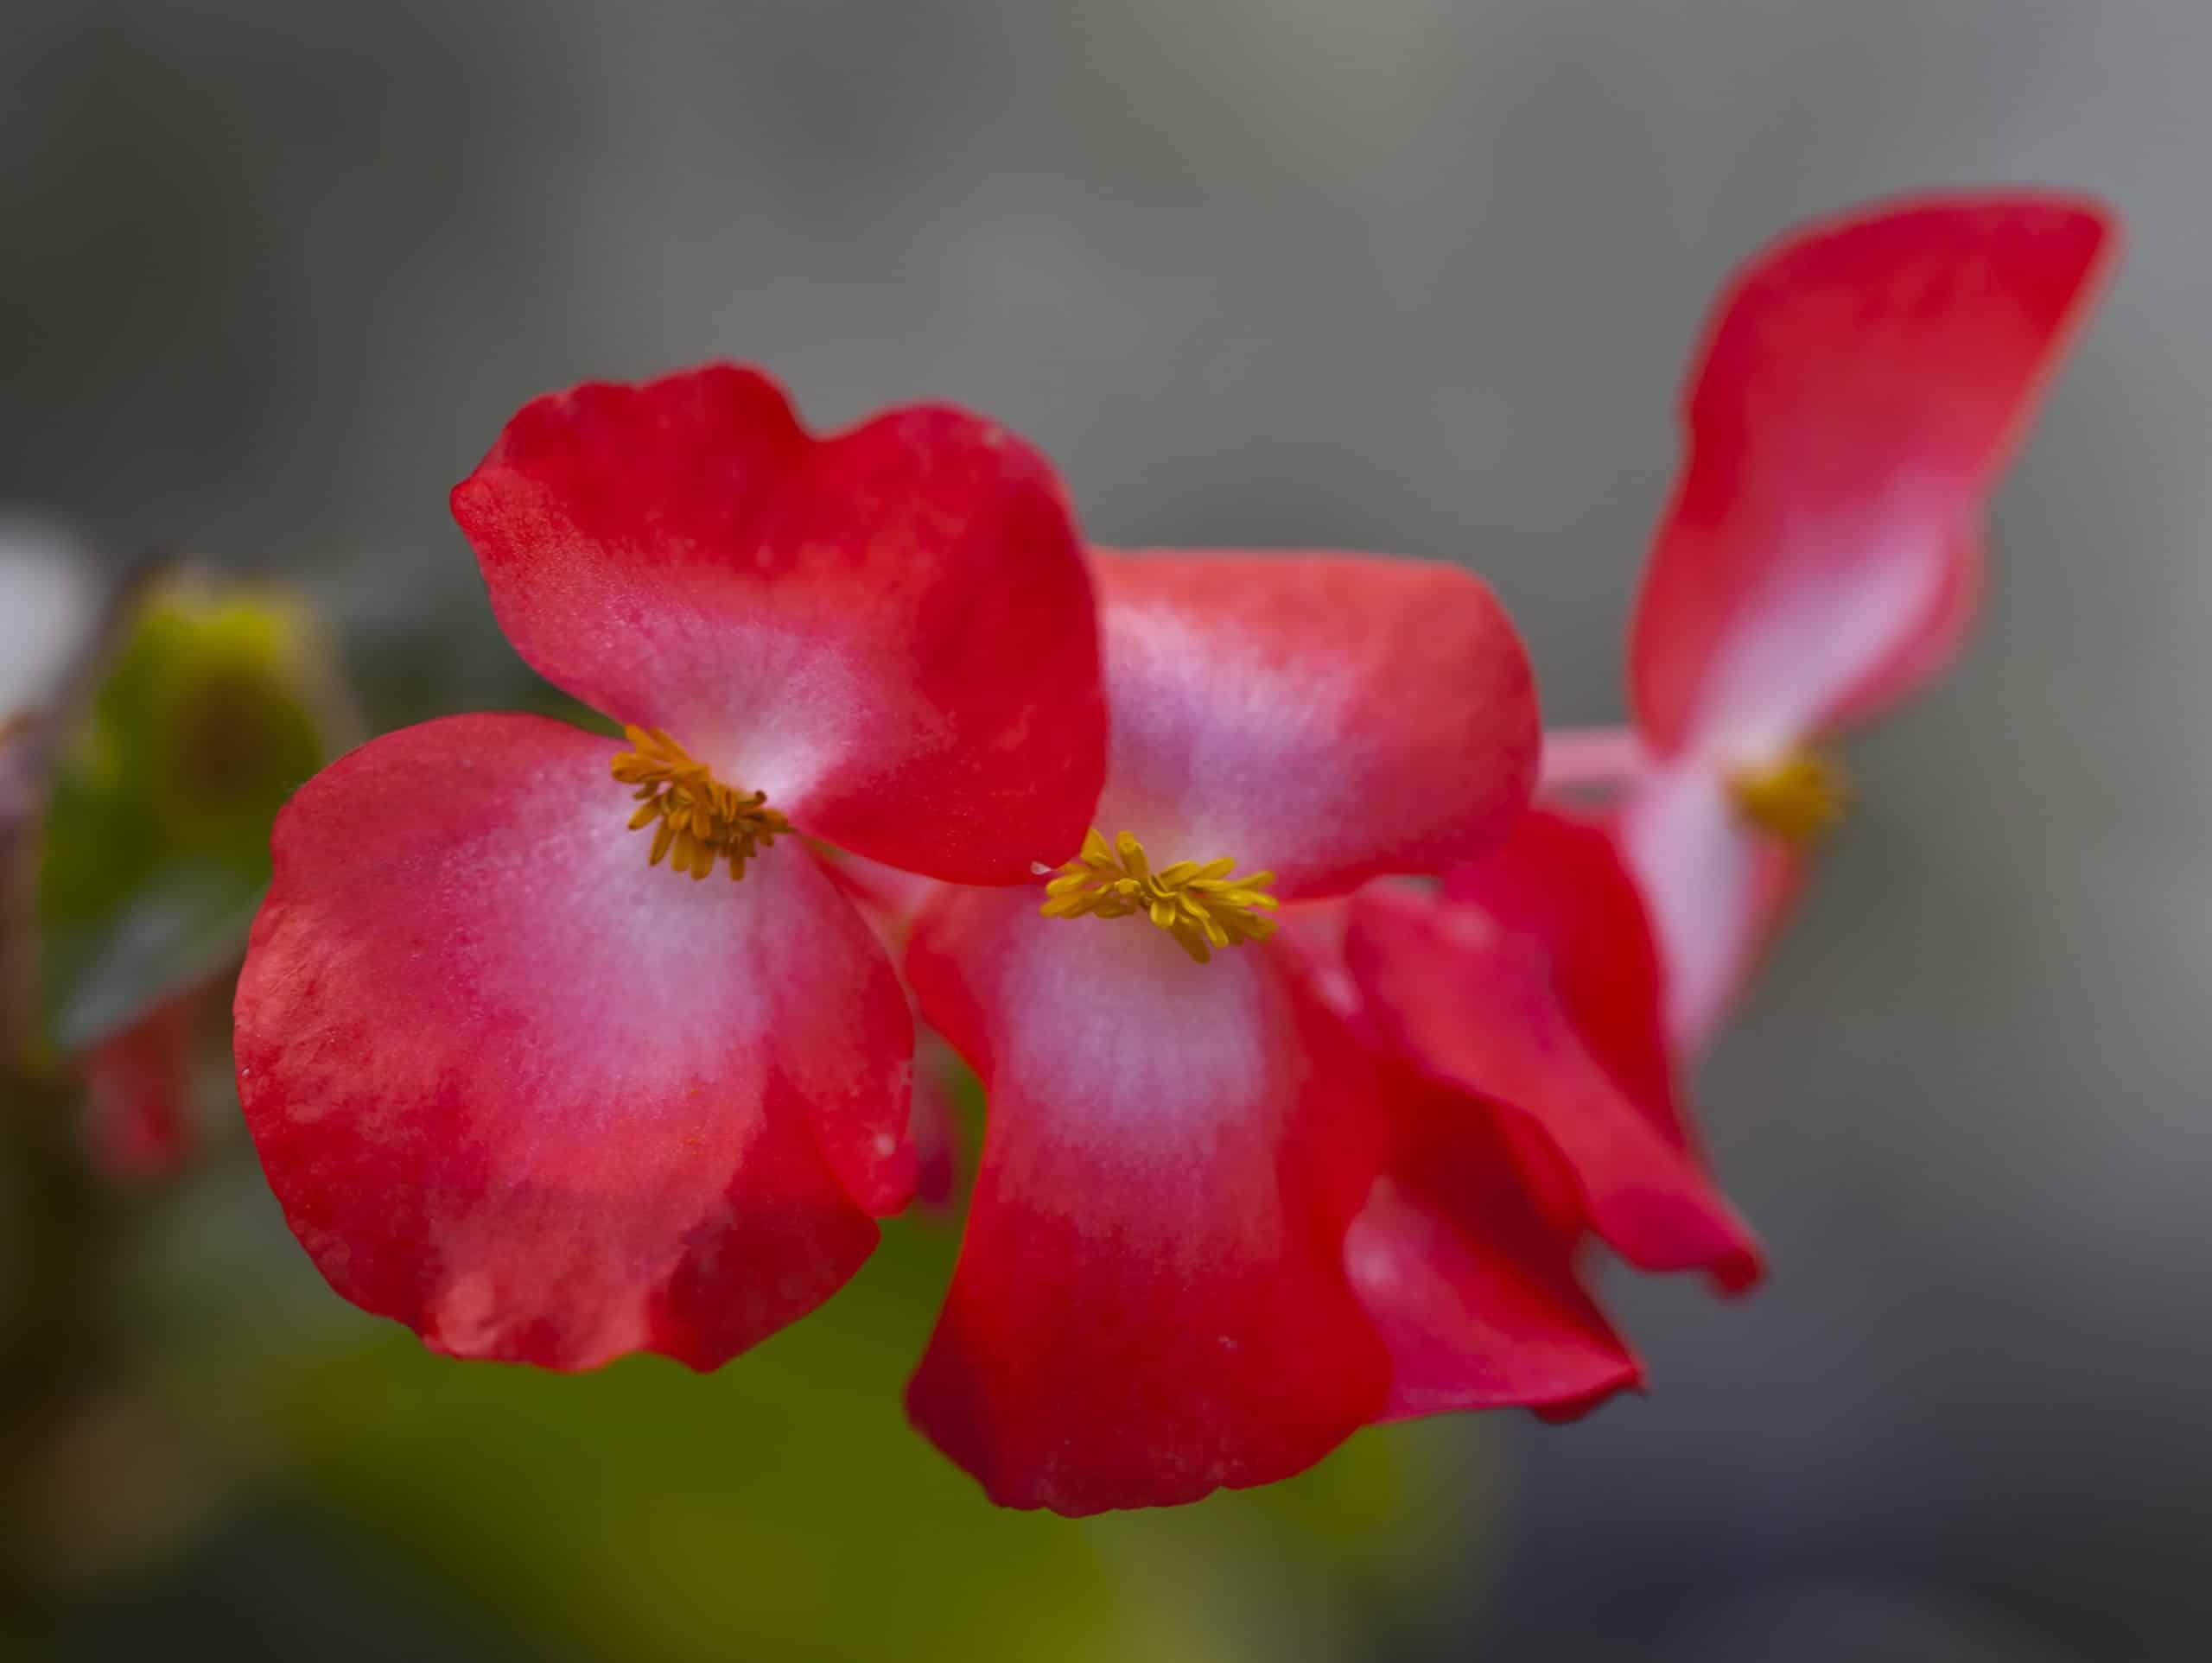 Begonia. (Begoniaceae).